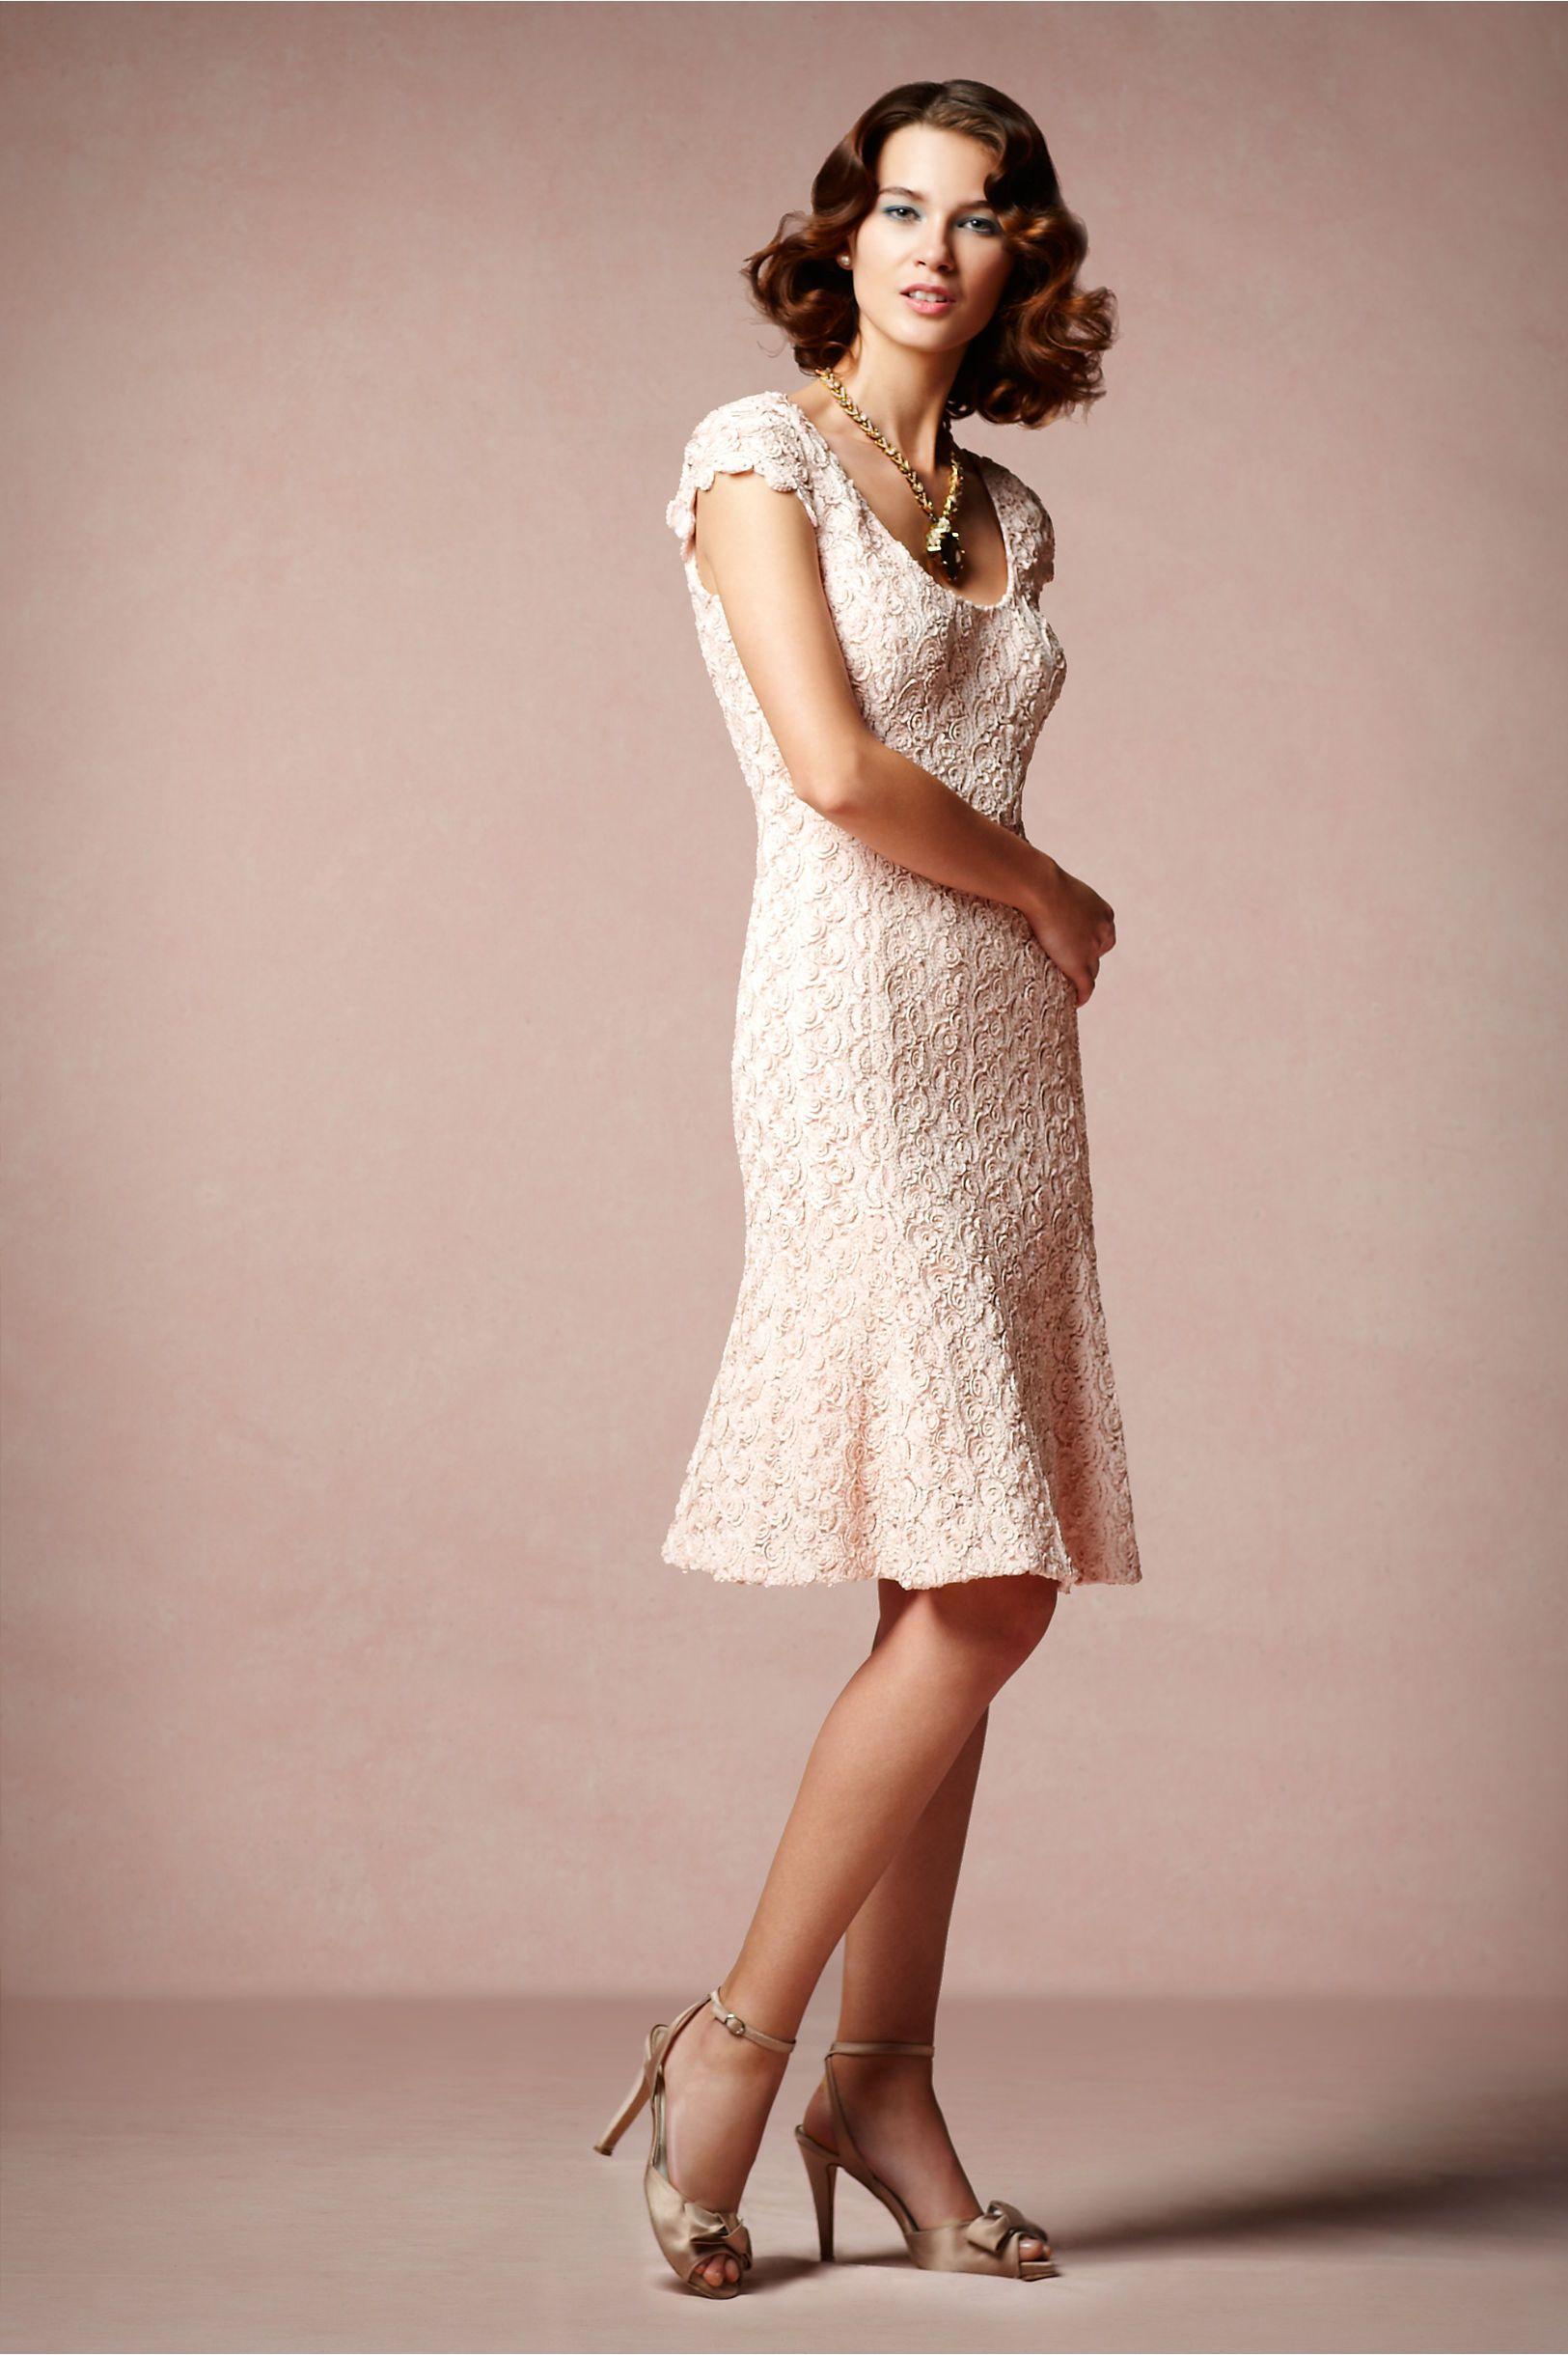 Rose Cava Dress in The Bride Reception Dresses at BHLDN | Crochet ...